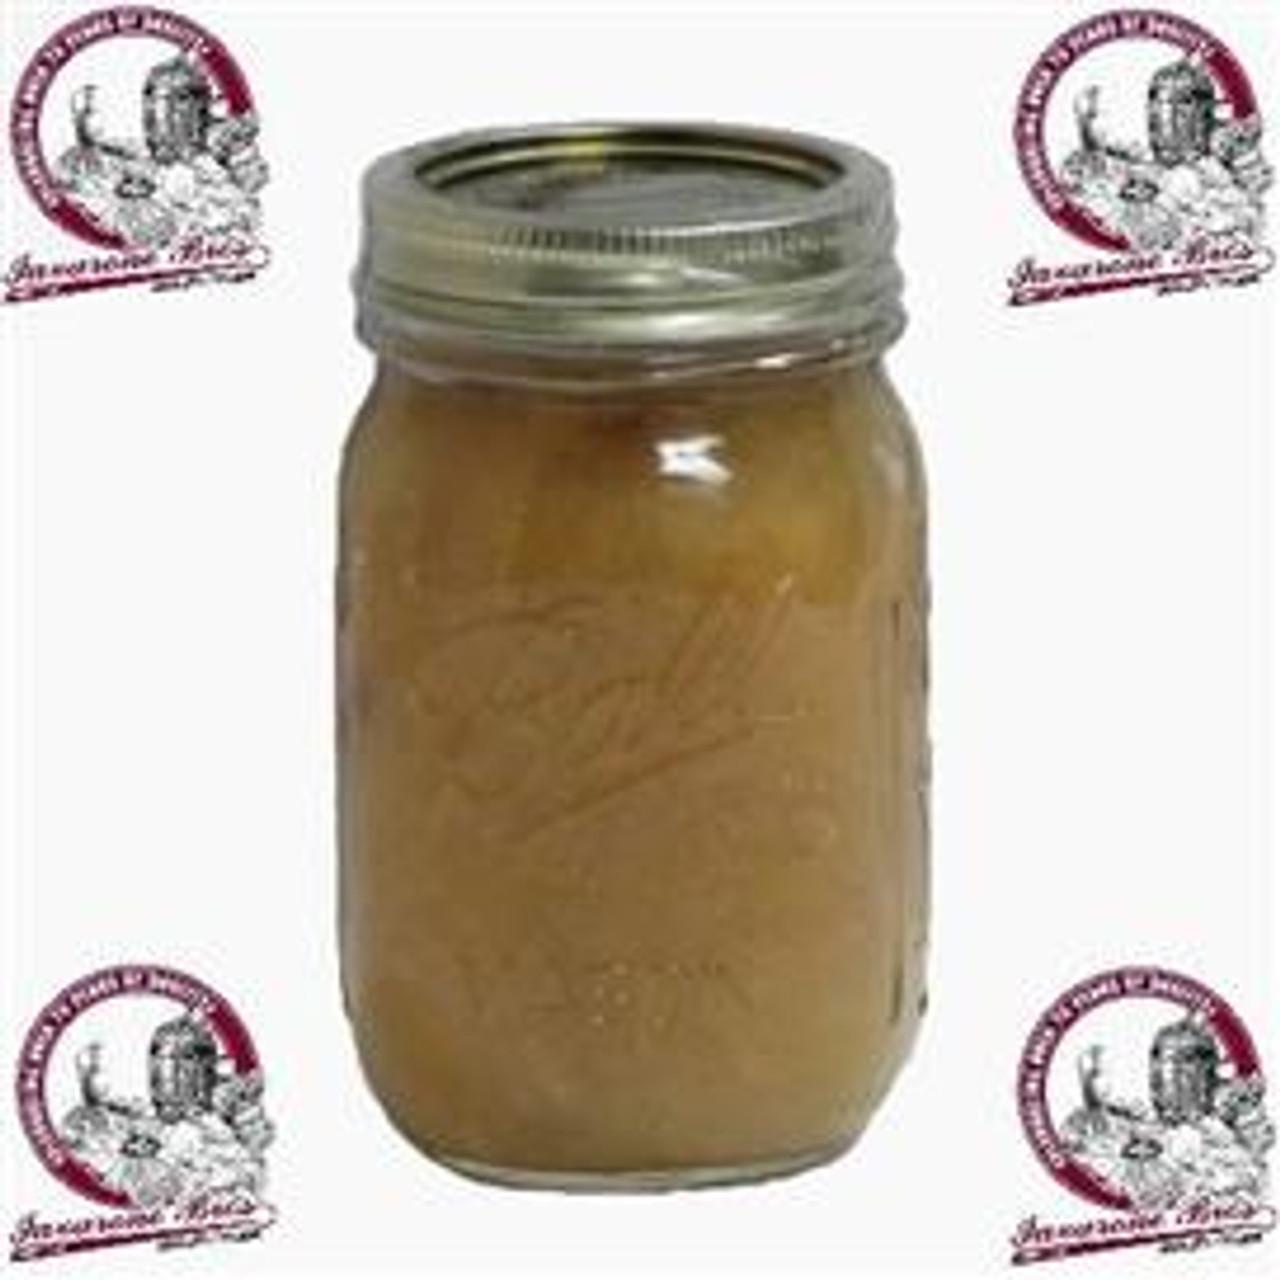 Original Recipe Apple Sauce